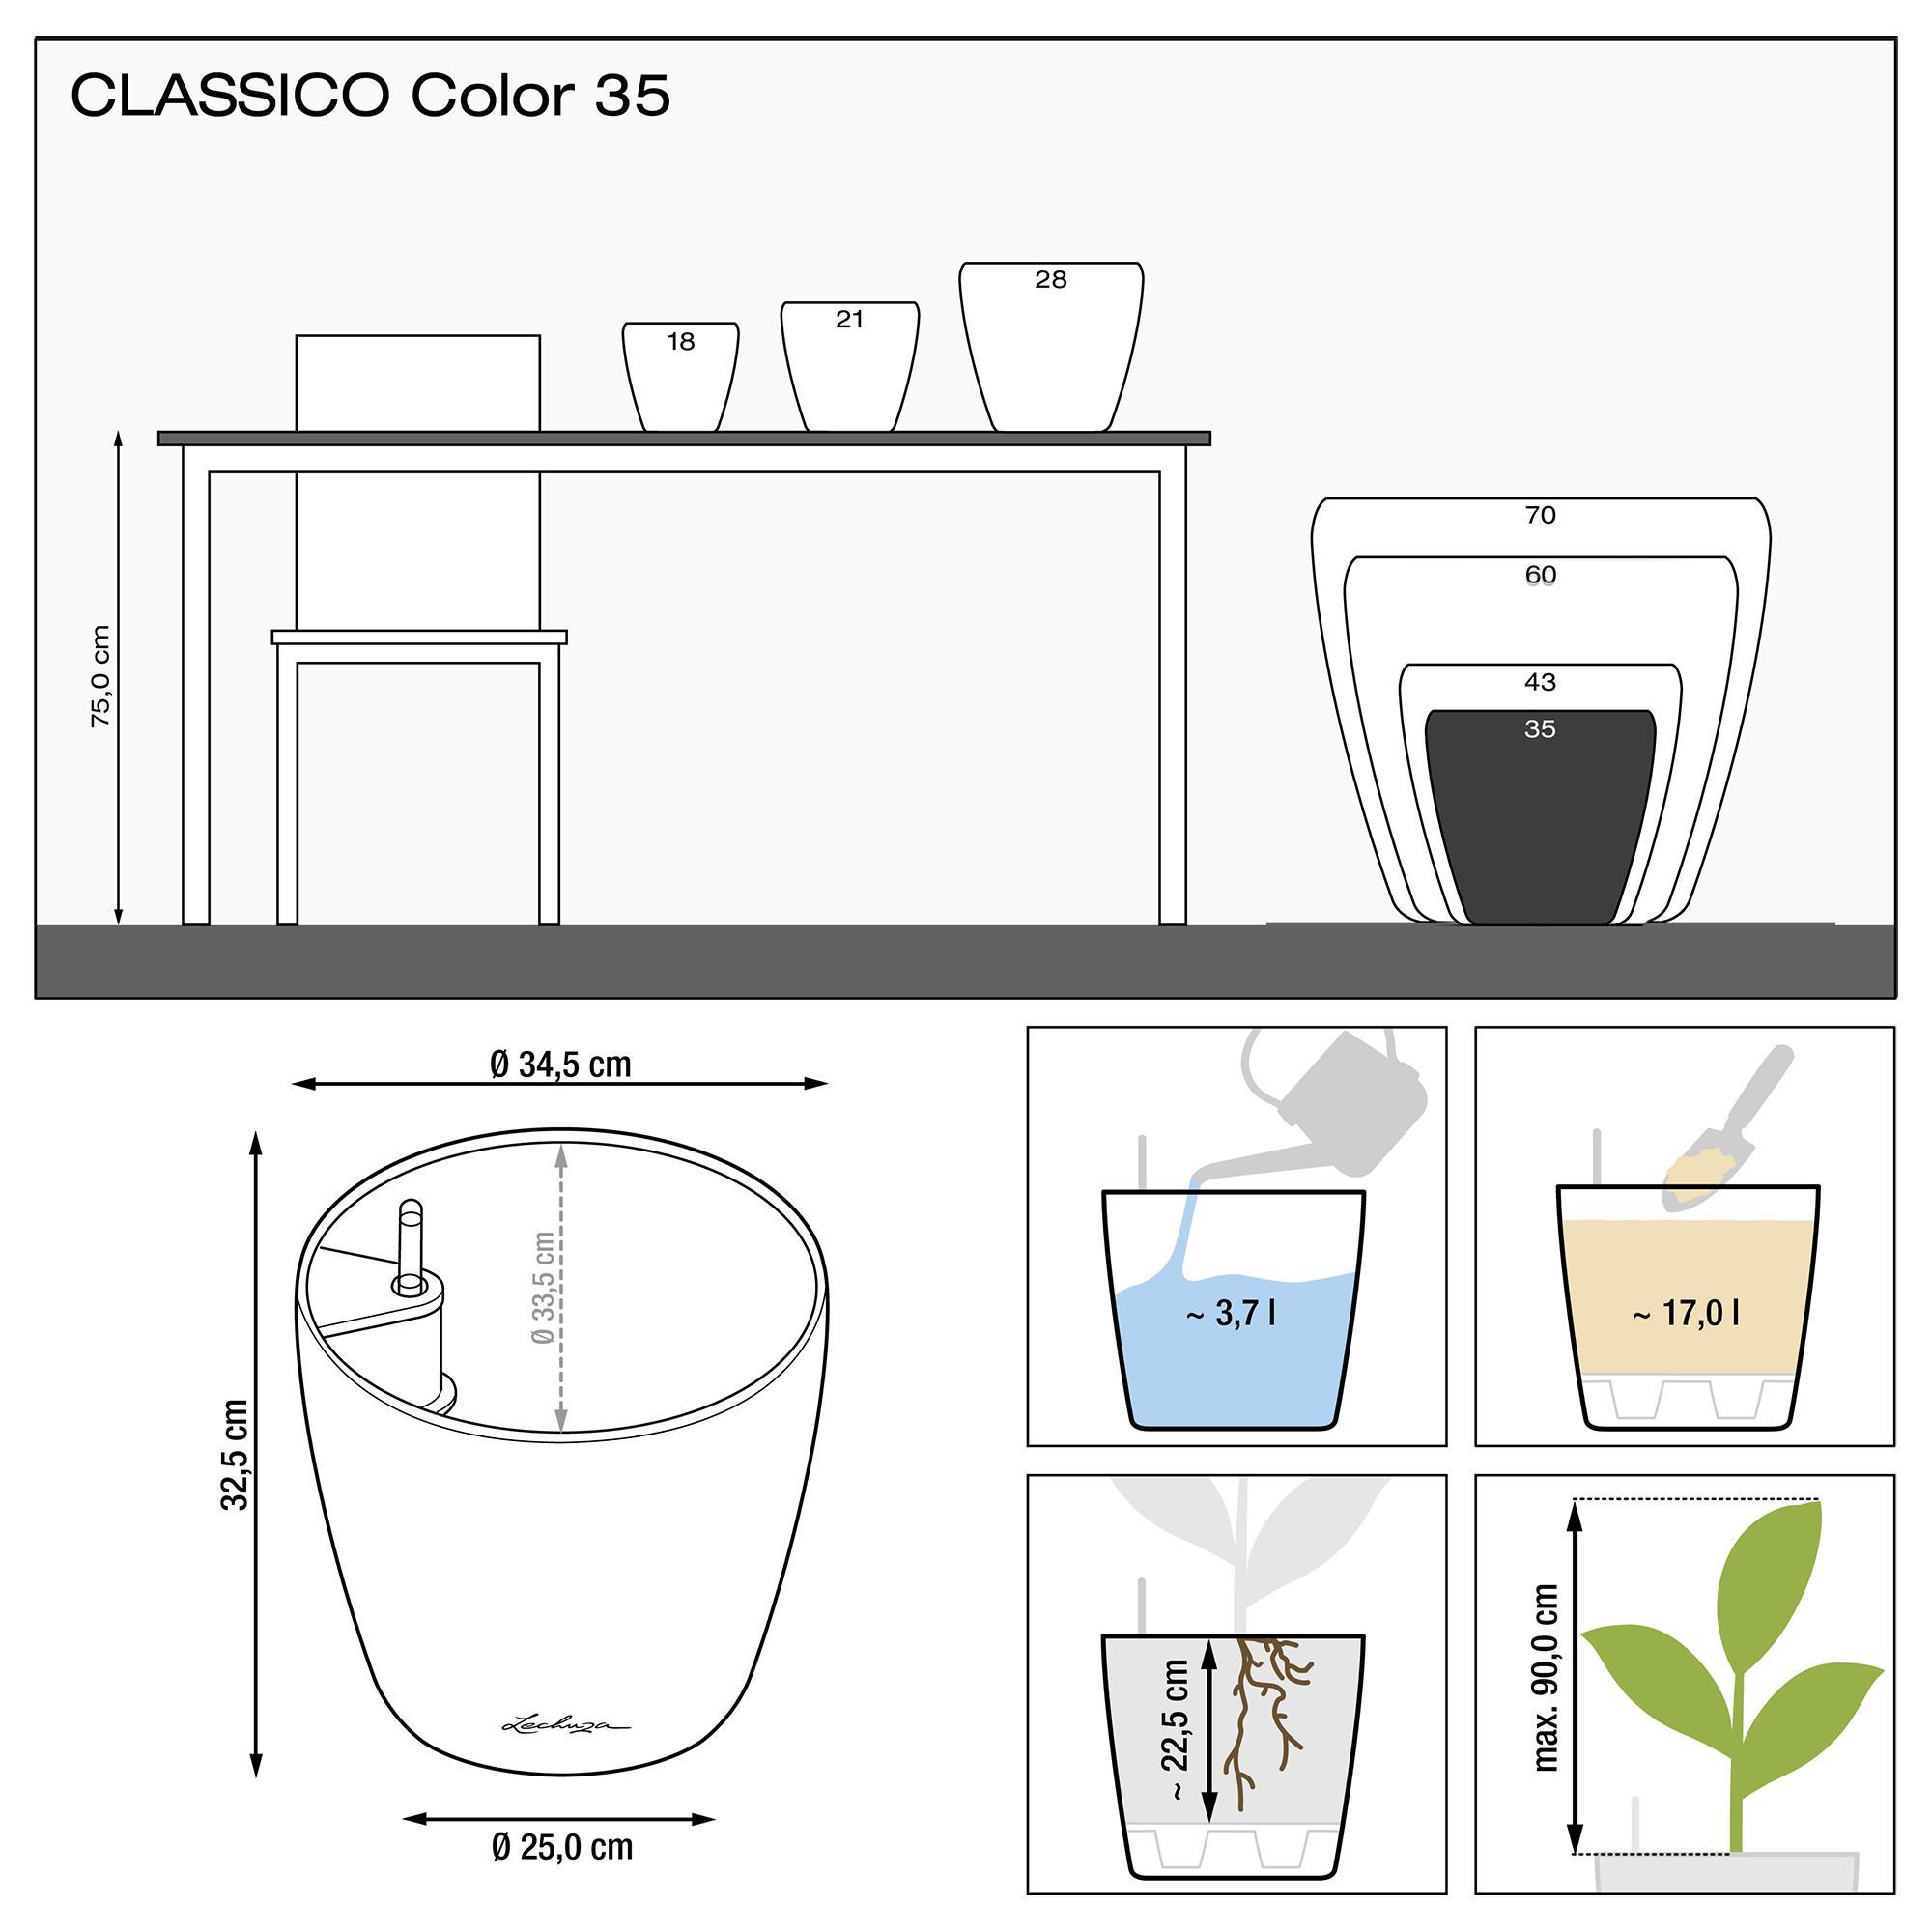 CLASSICO Color 35 muskat - Bild 2